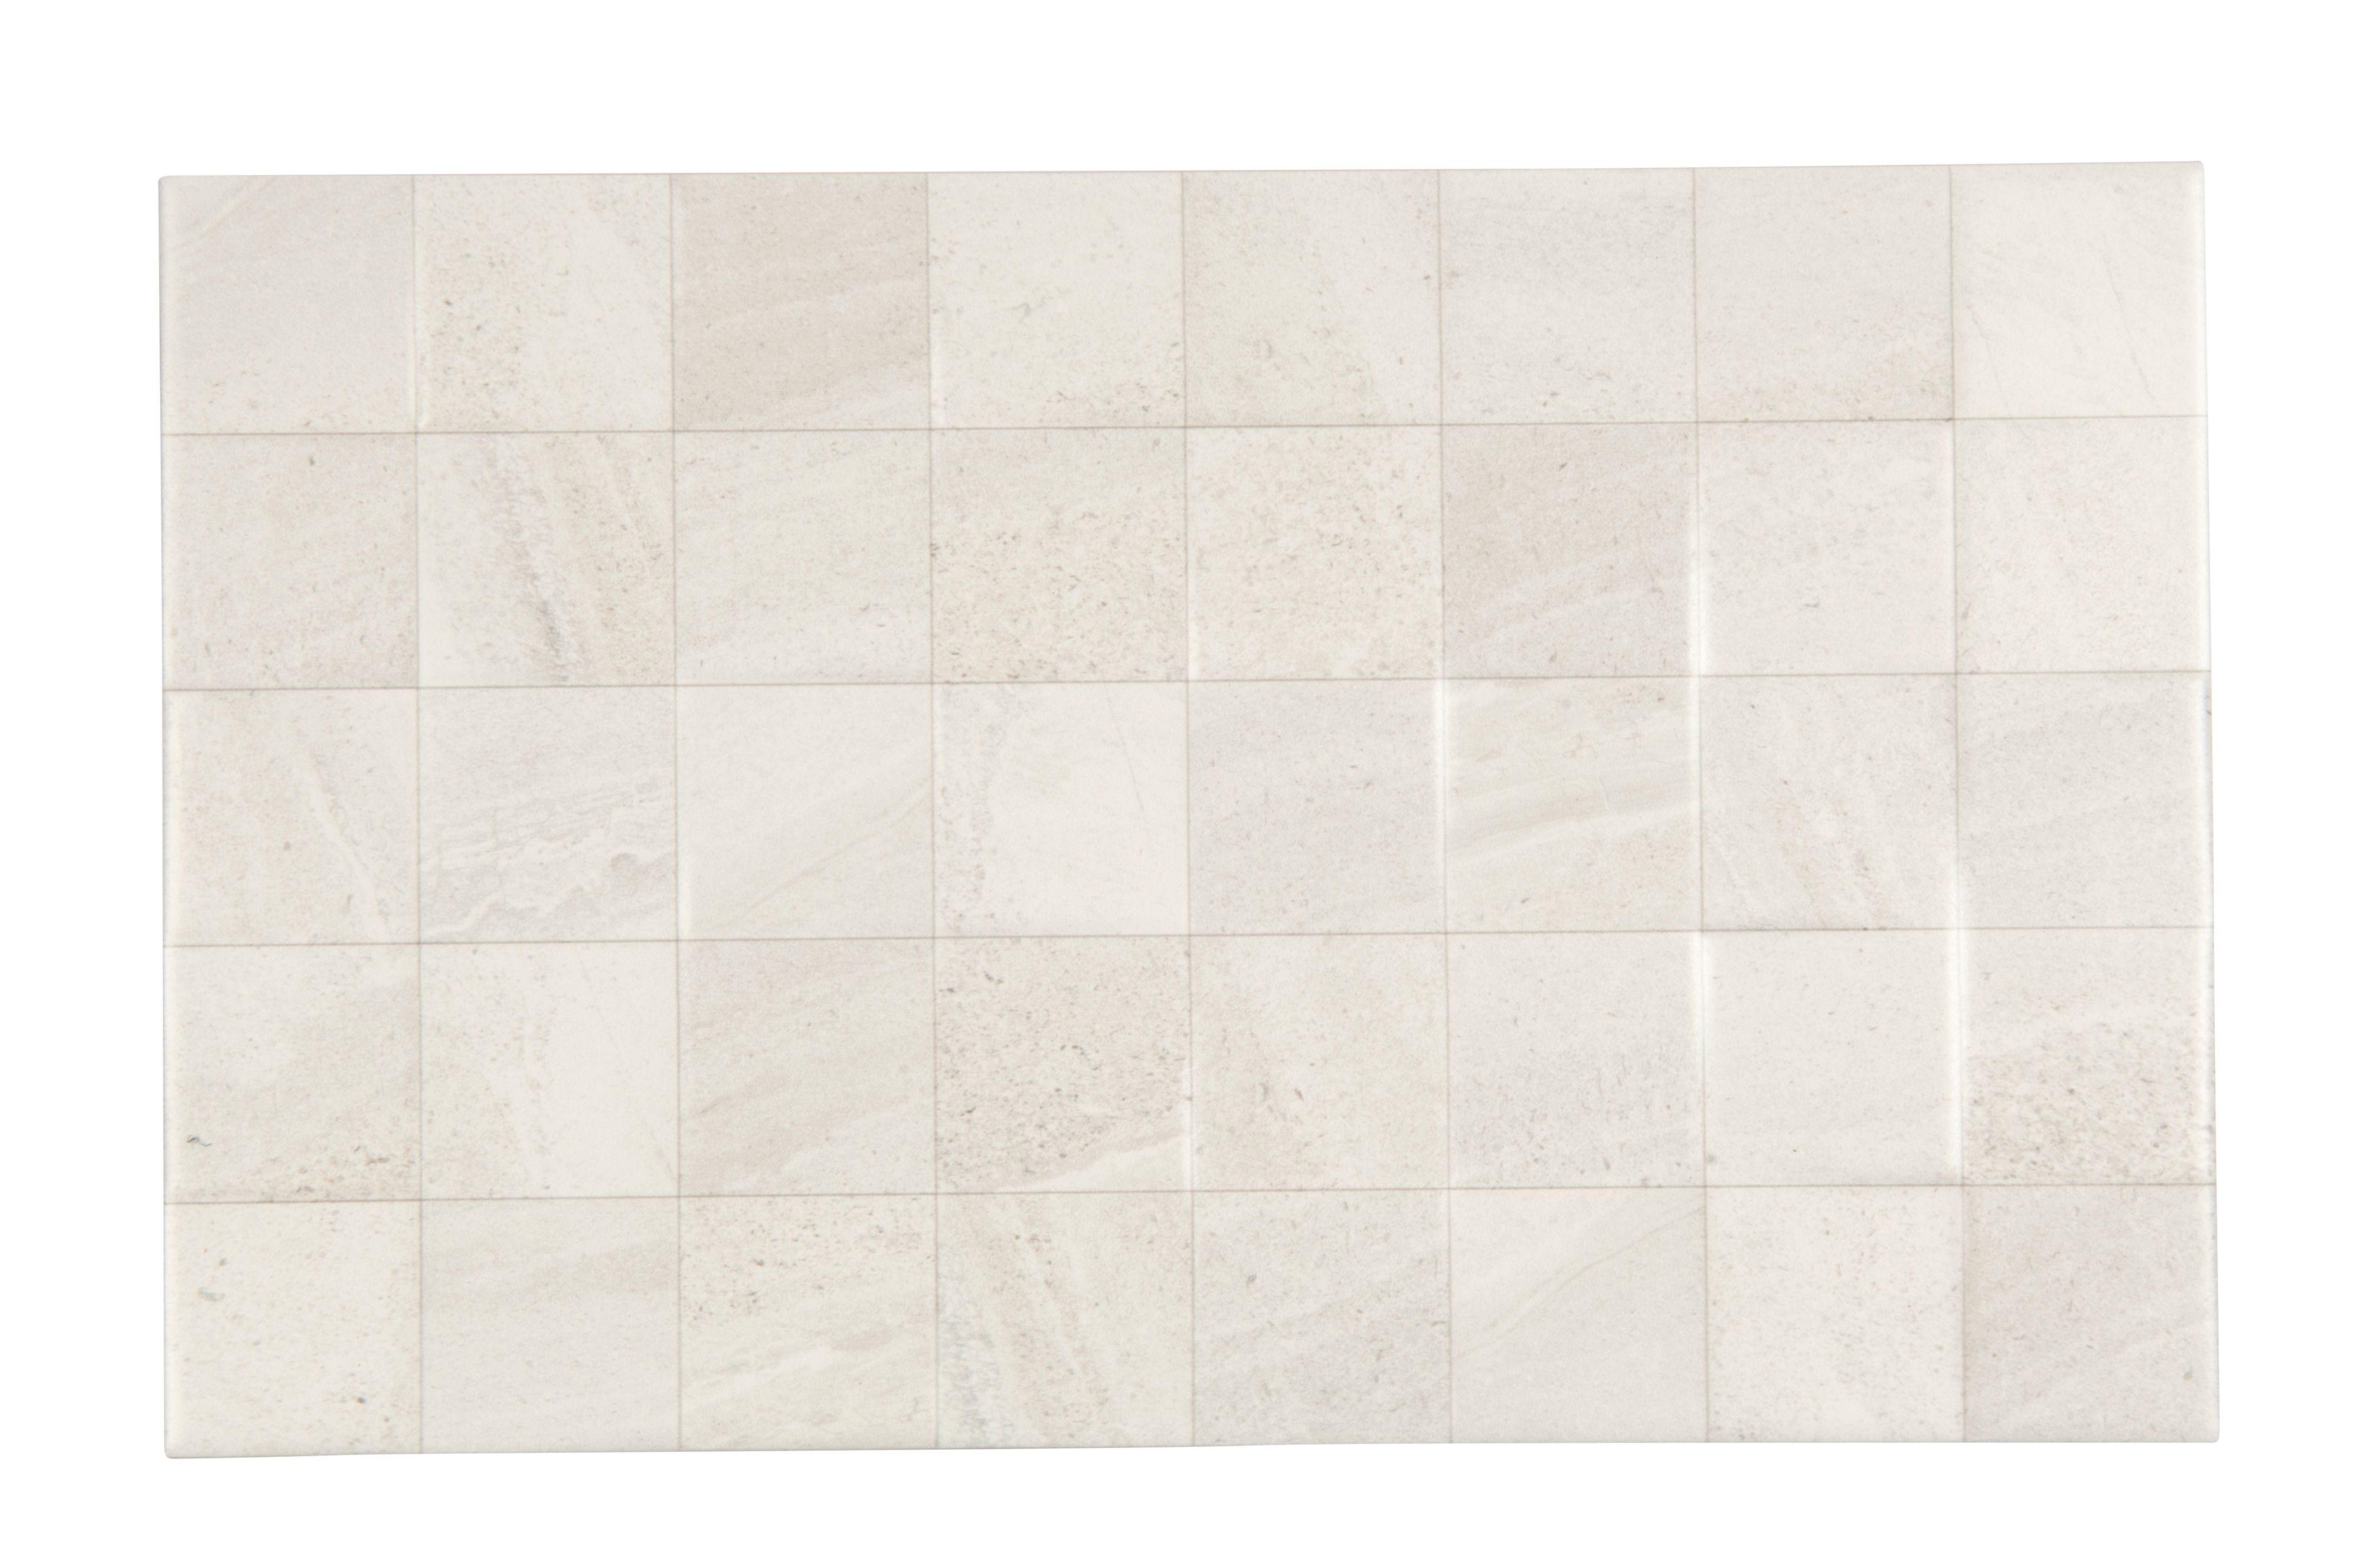 Fiji white stone effect ceramic wall tile pack of 10 l400mm w fiji white ceramic wall tile pack of 10 l400mm w dailygadgetfo Choice Image